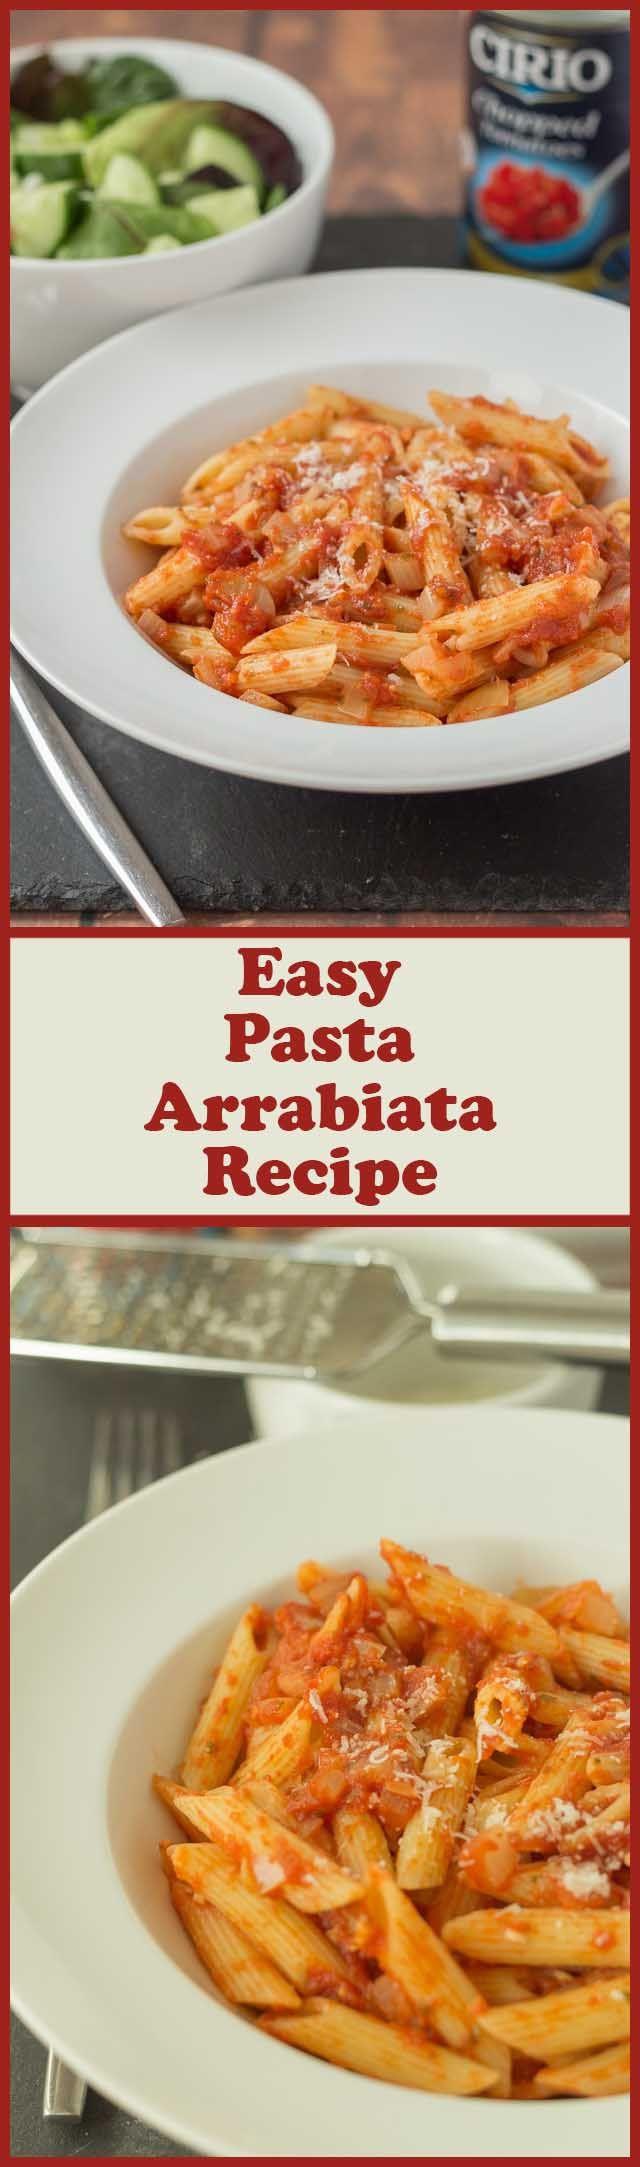 Best 25 All Arrabiata Ideas Only On Pinterest Pochierte Eier Pochierte Ei Rezepte And Pasta Rezepte Arrabiata